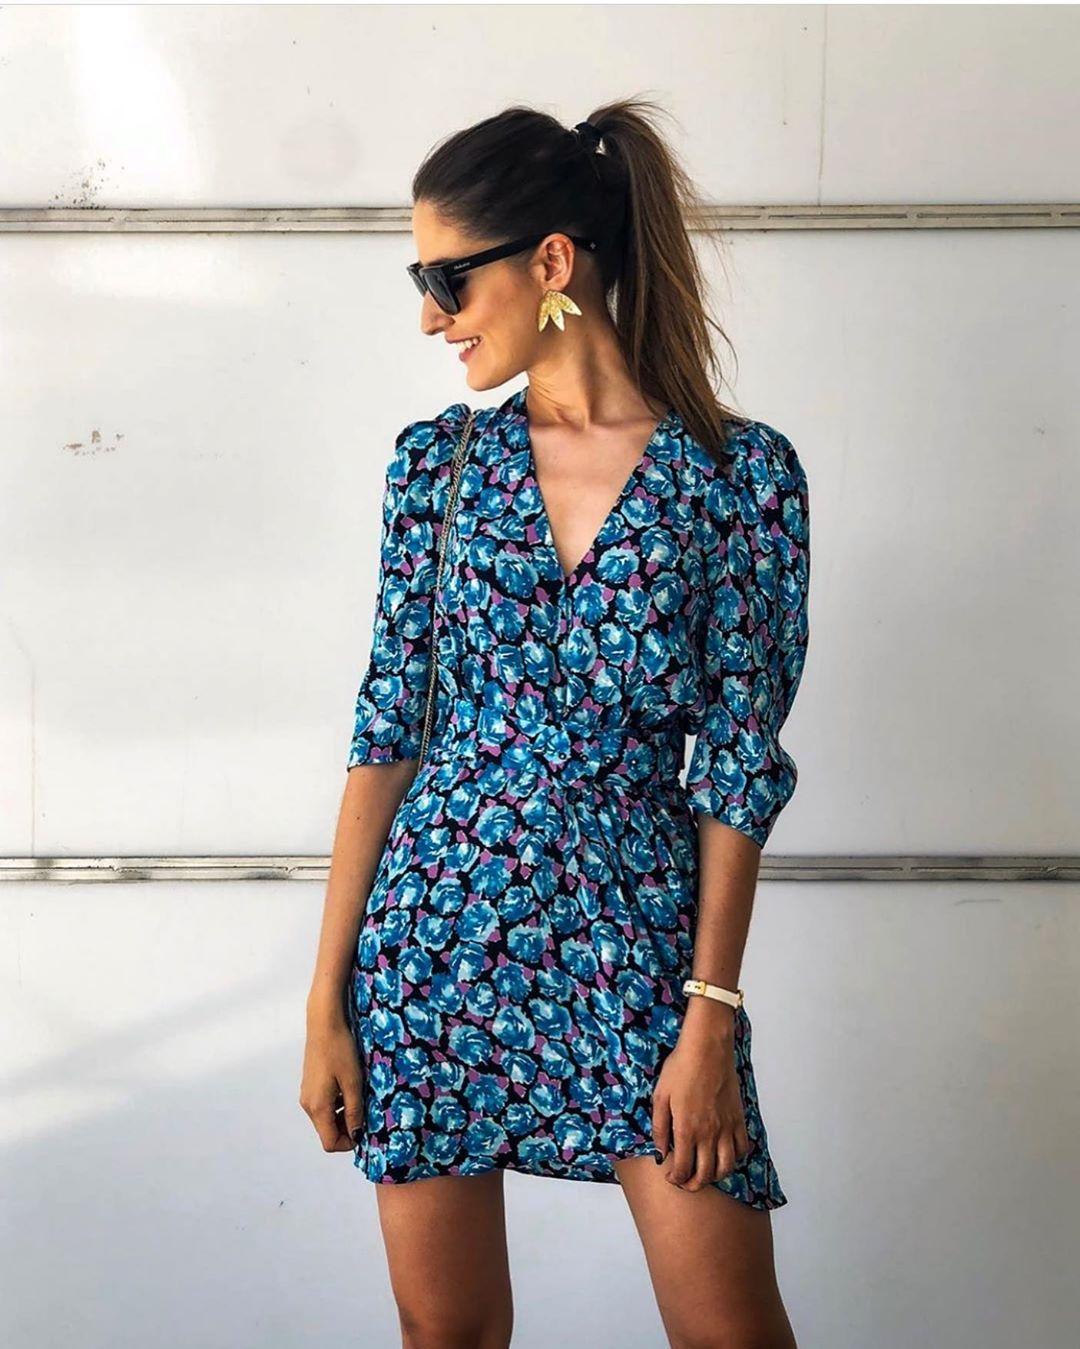 puff print dress de Zara sur streetzarastyle